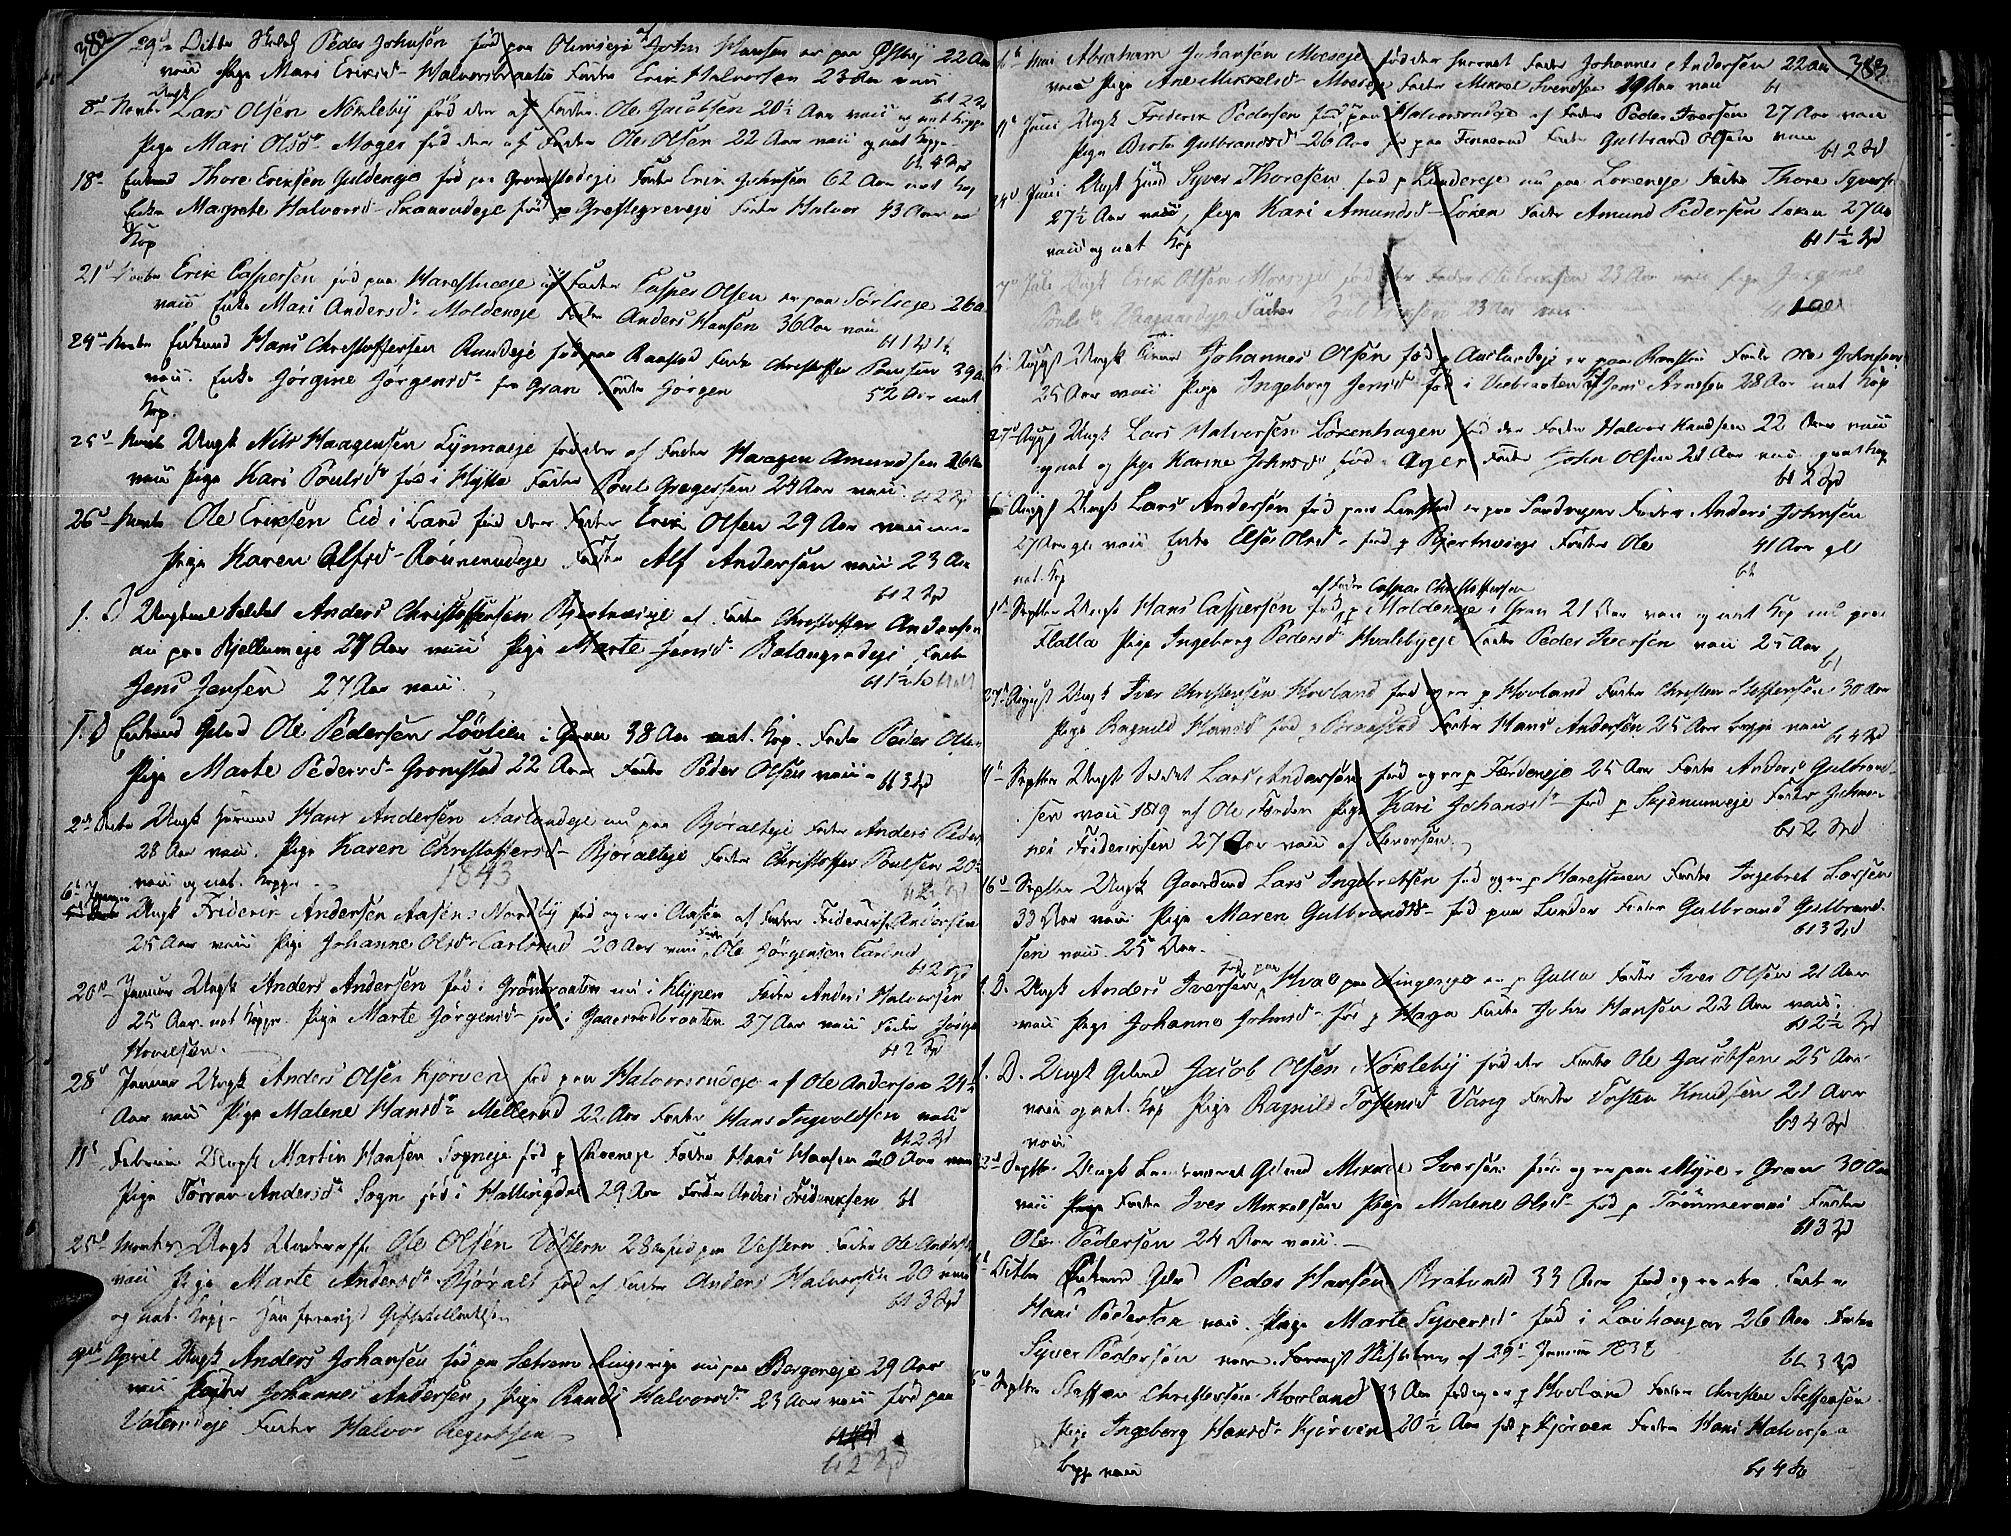 SAH, Jevnaker prestekontor, Ministerialbok nr. 4, 1800-1861, s. 382-383